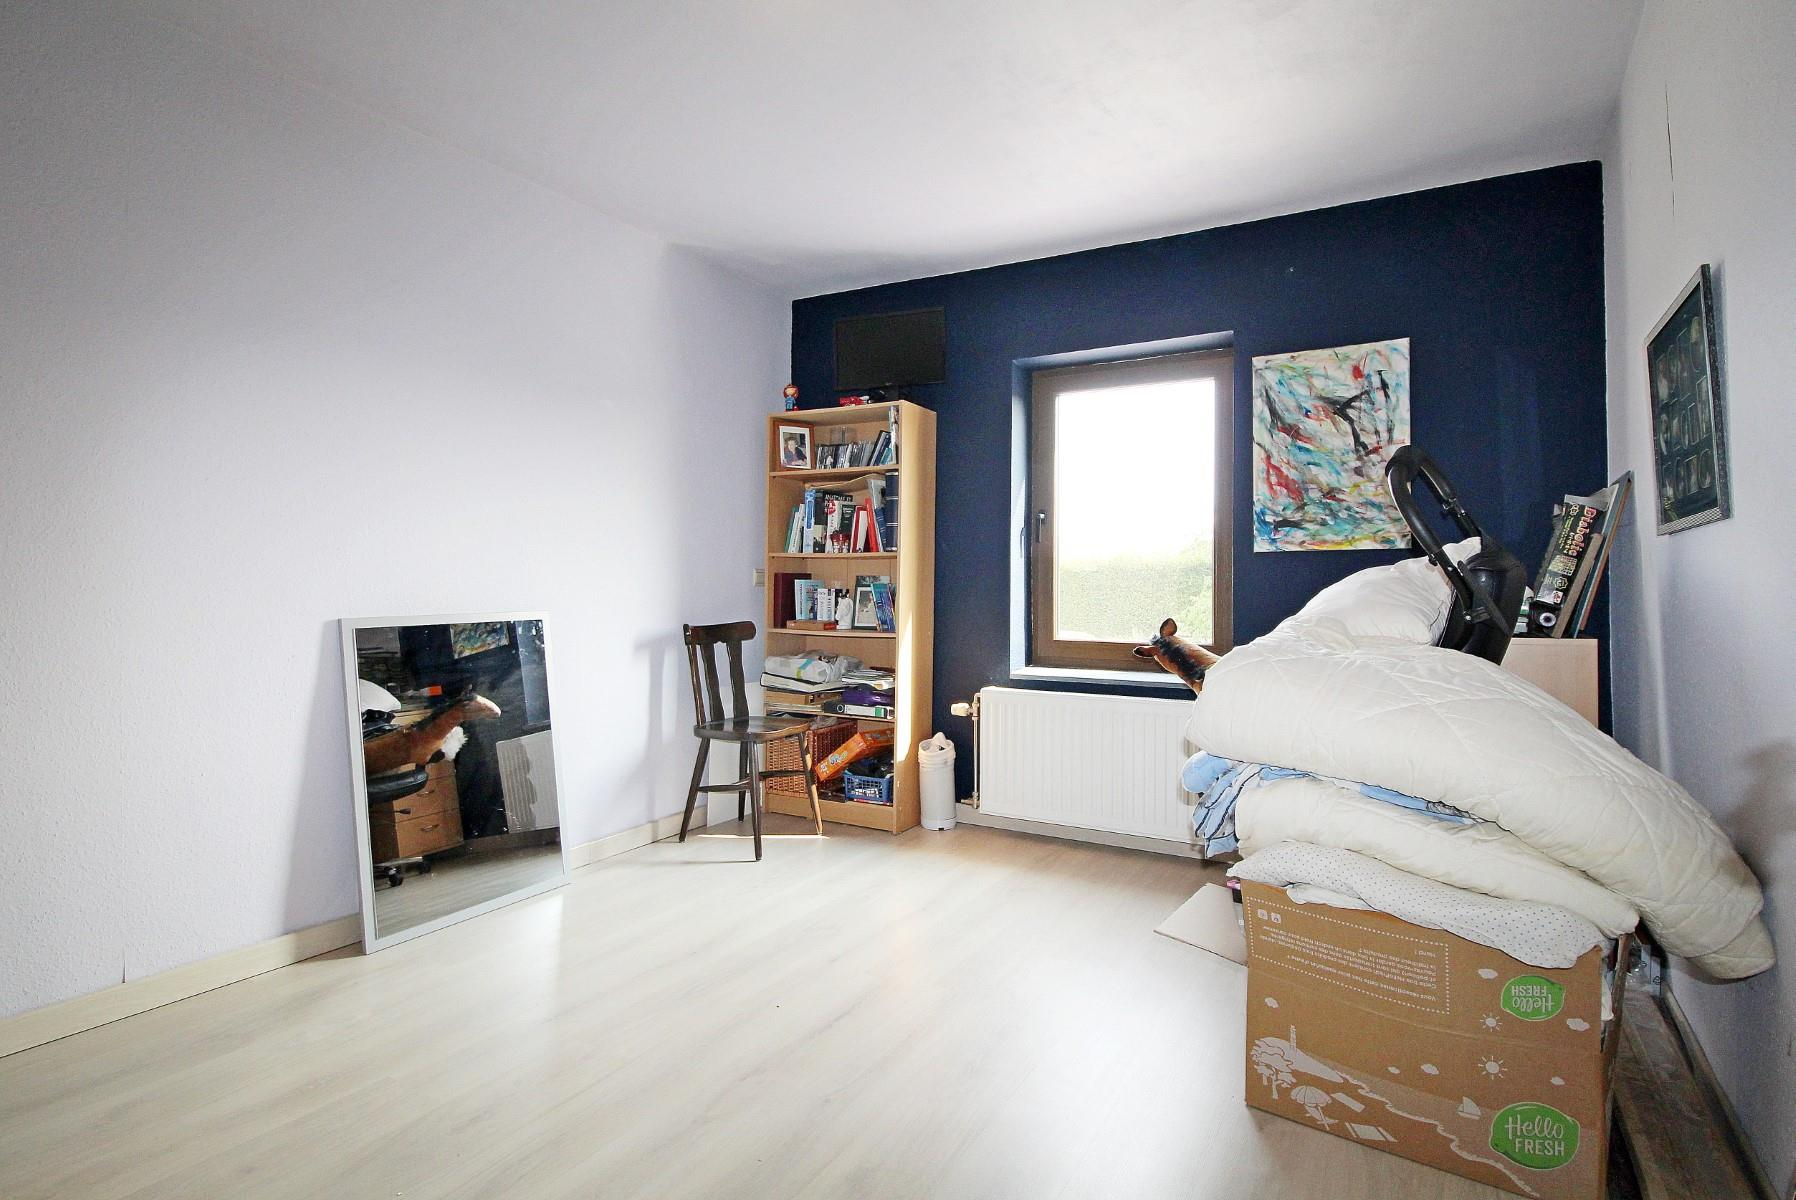 Maison - Bolinne - #4164476-11